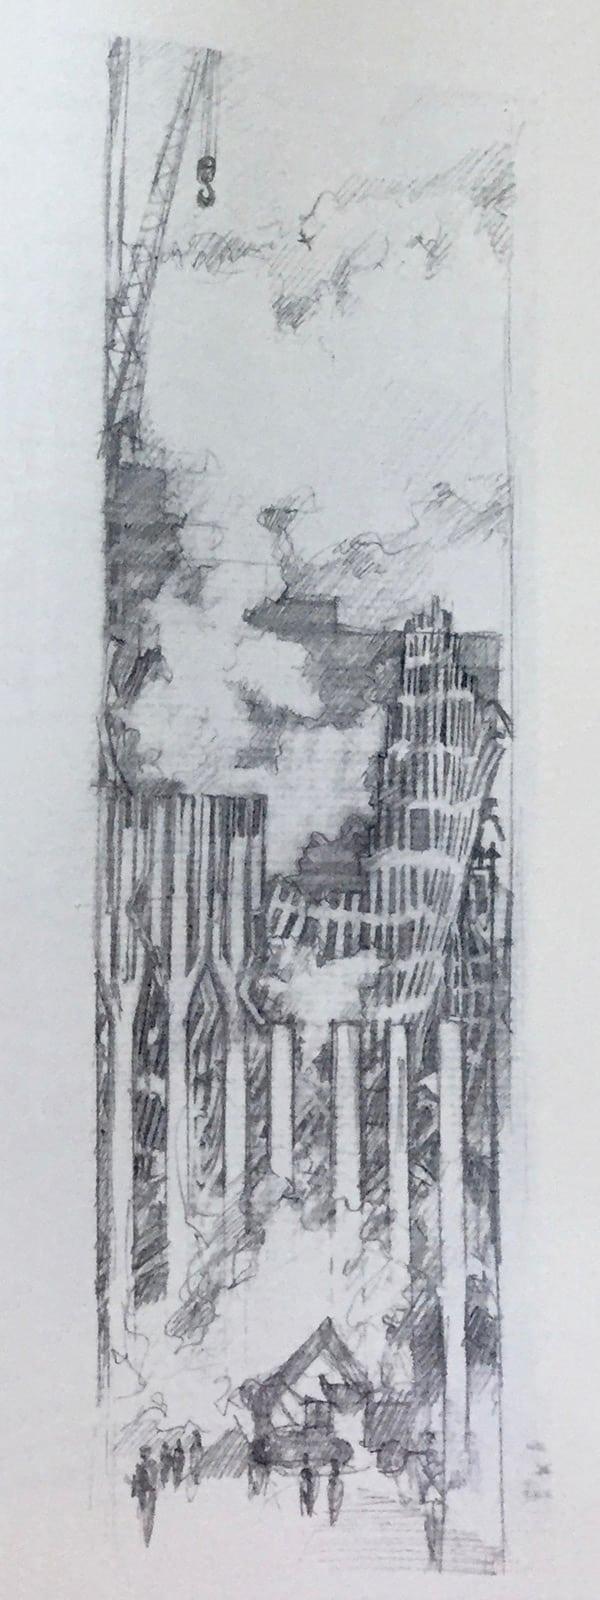 9:11_1